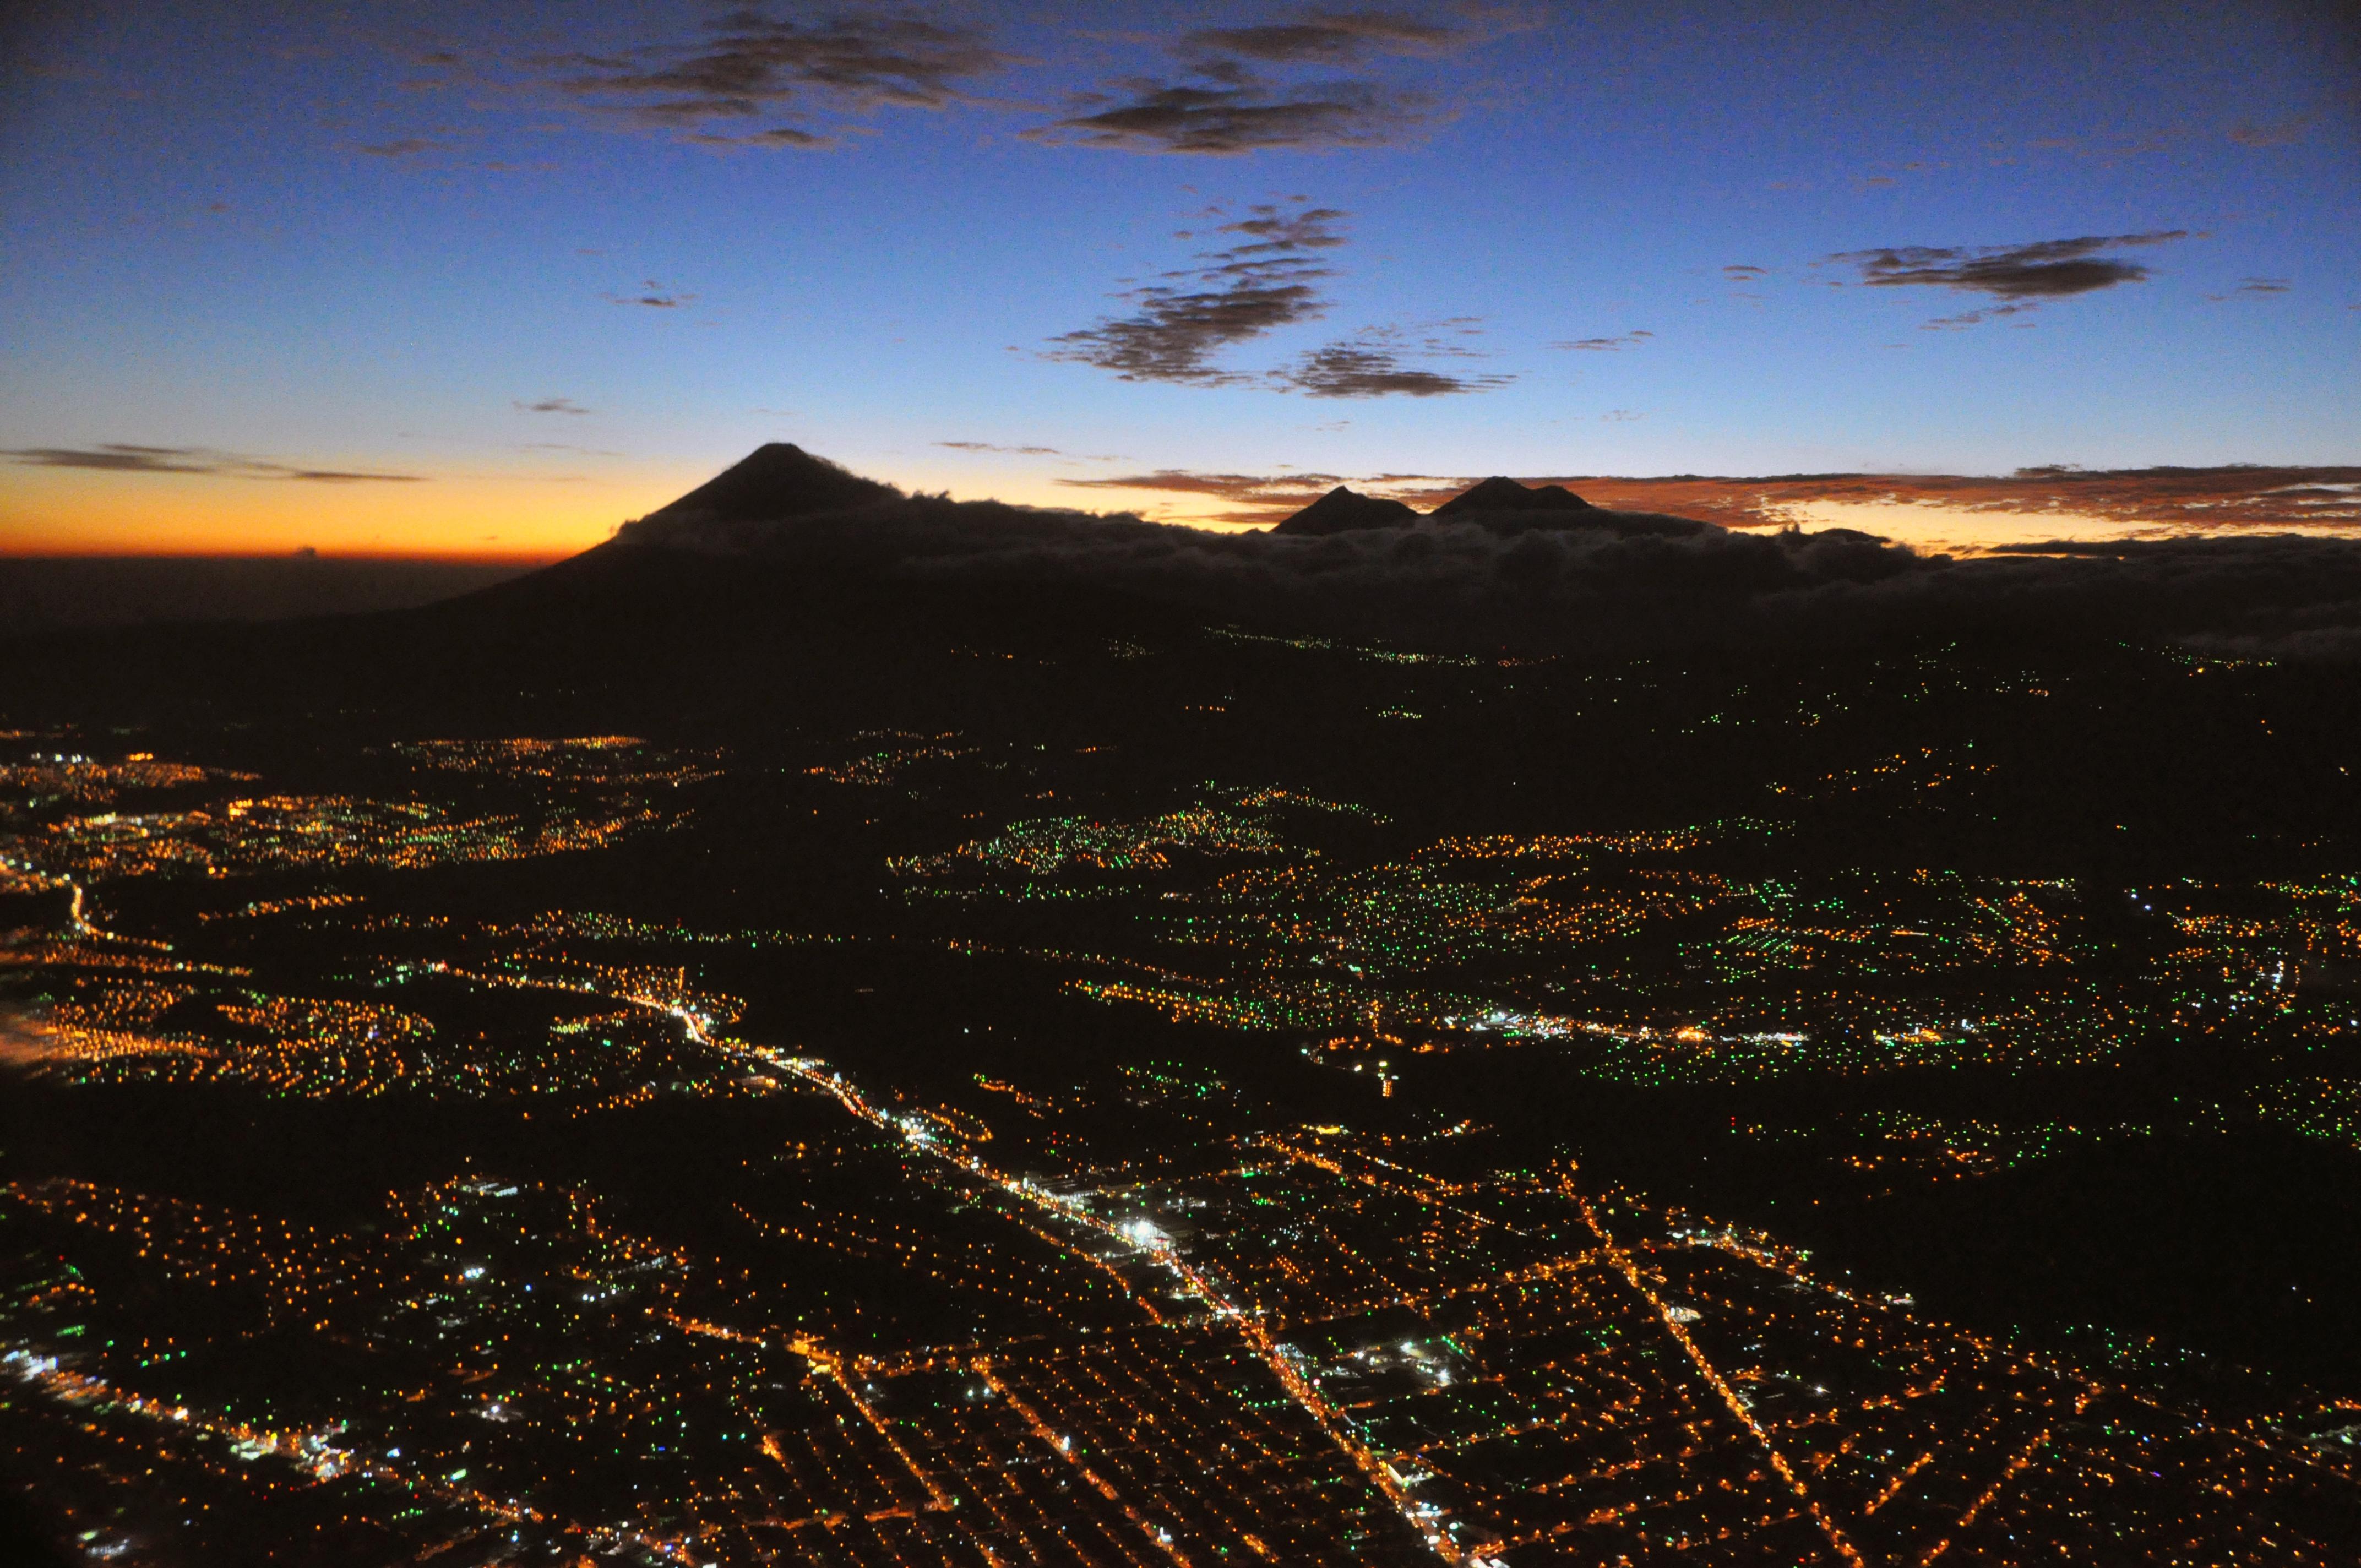 Guatemala City Guatemala  city photos gallery : Description Guatemala city aerial night b